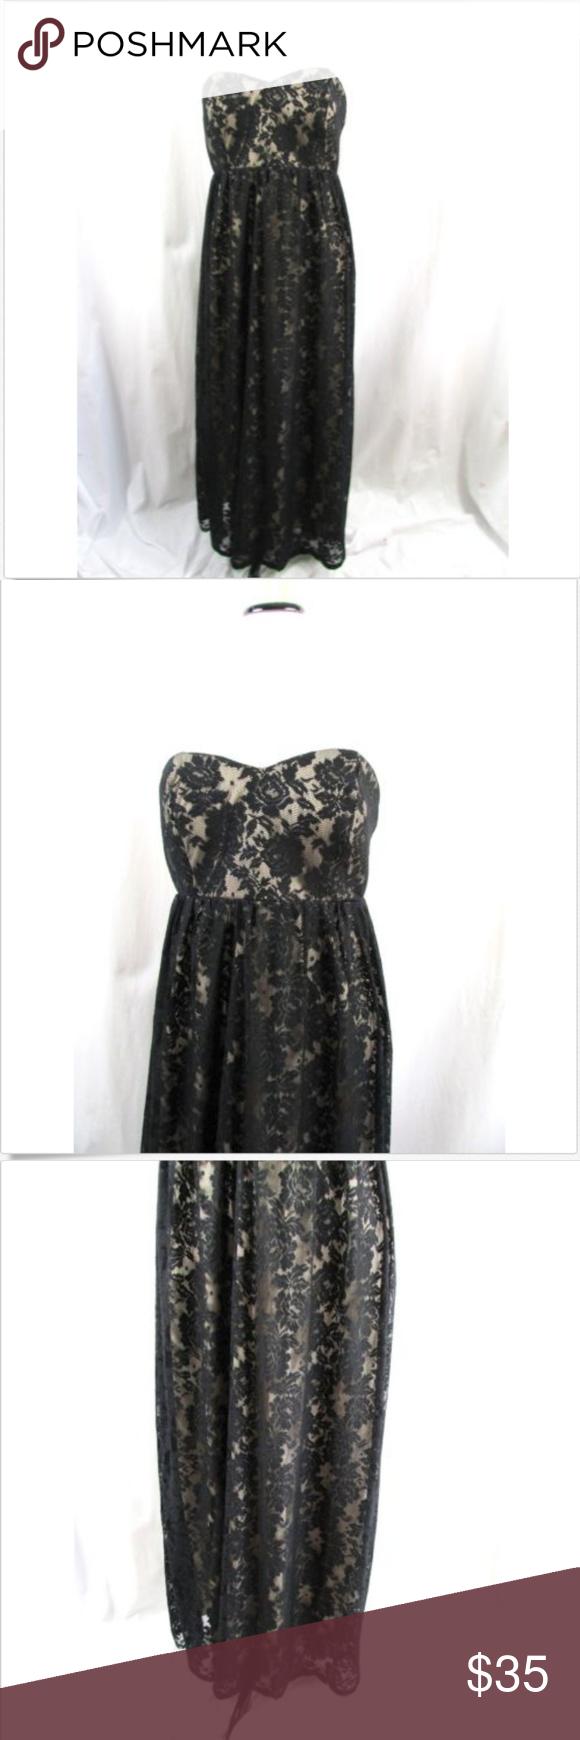 Lace dress torrid  Torrid Black Floral Lace Strapless Maxi Dress in   My Posh